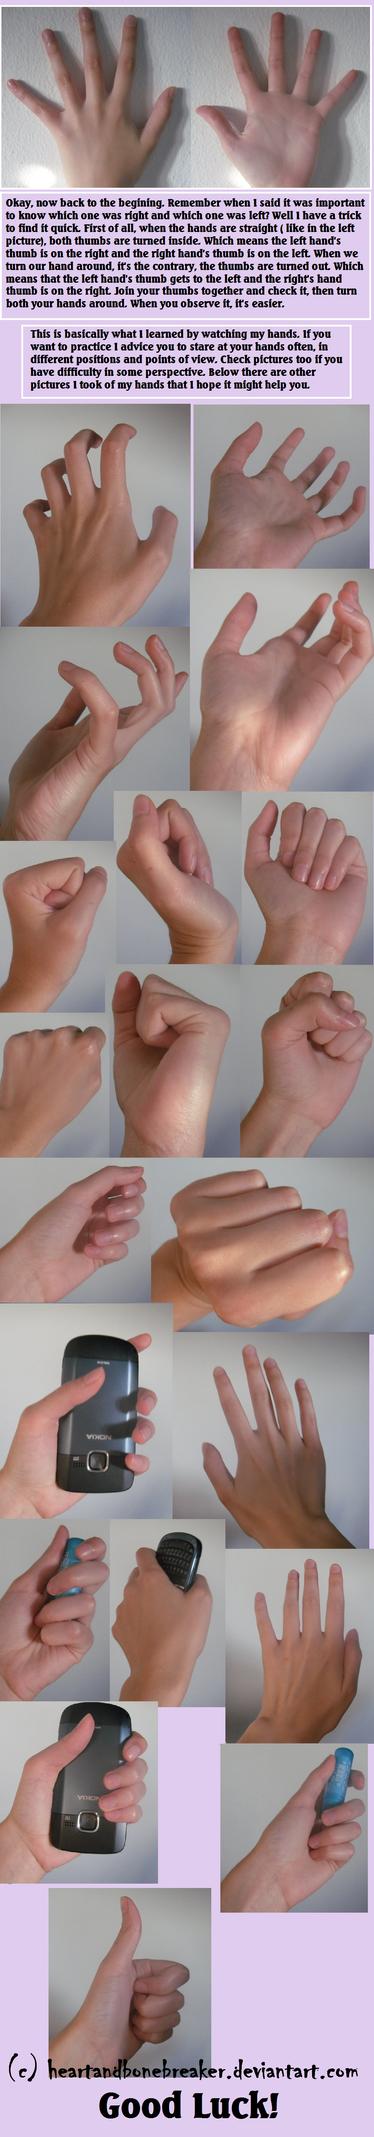 Hands tutorial part 2 by heartandbonebreaker